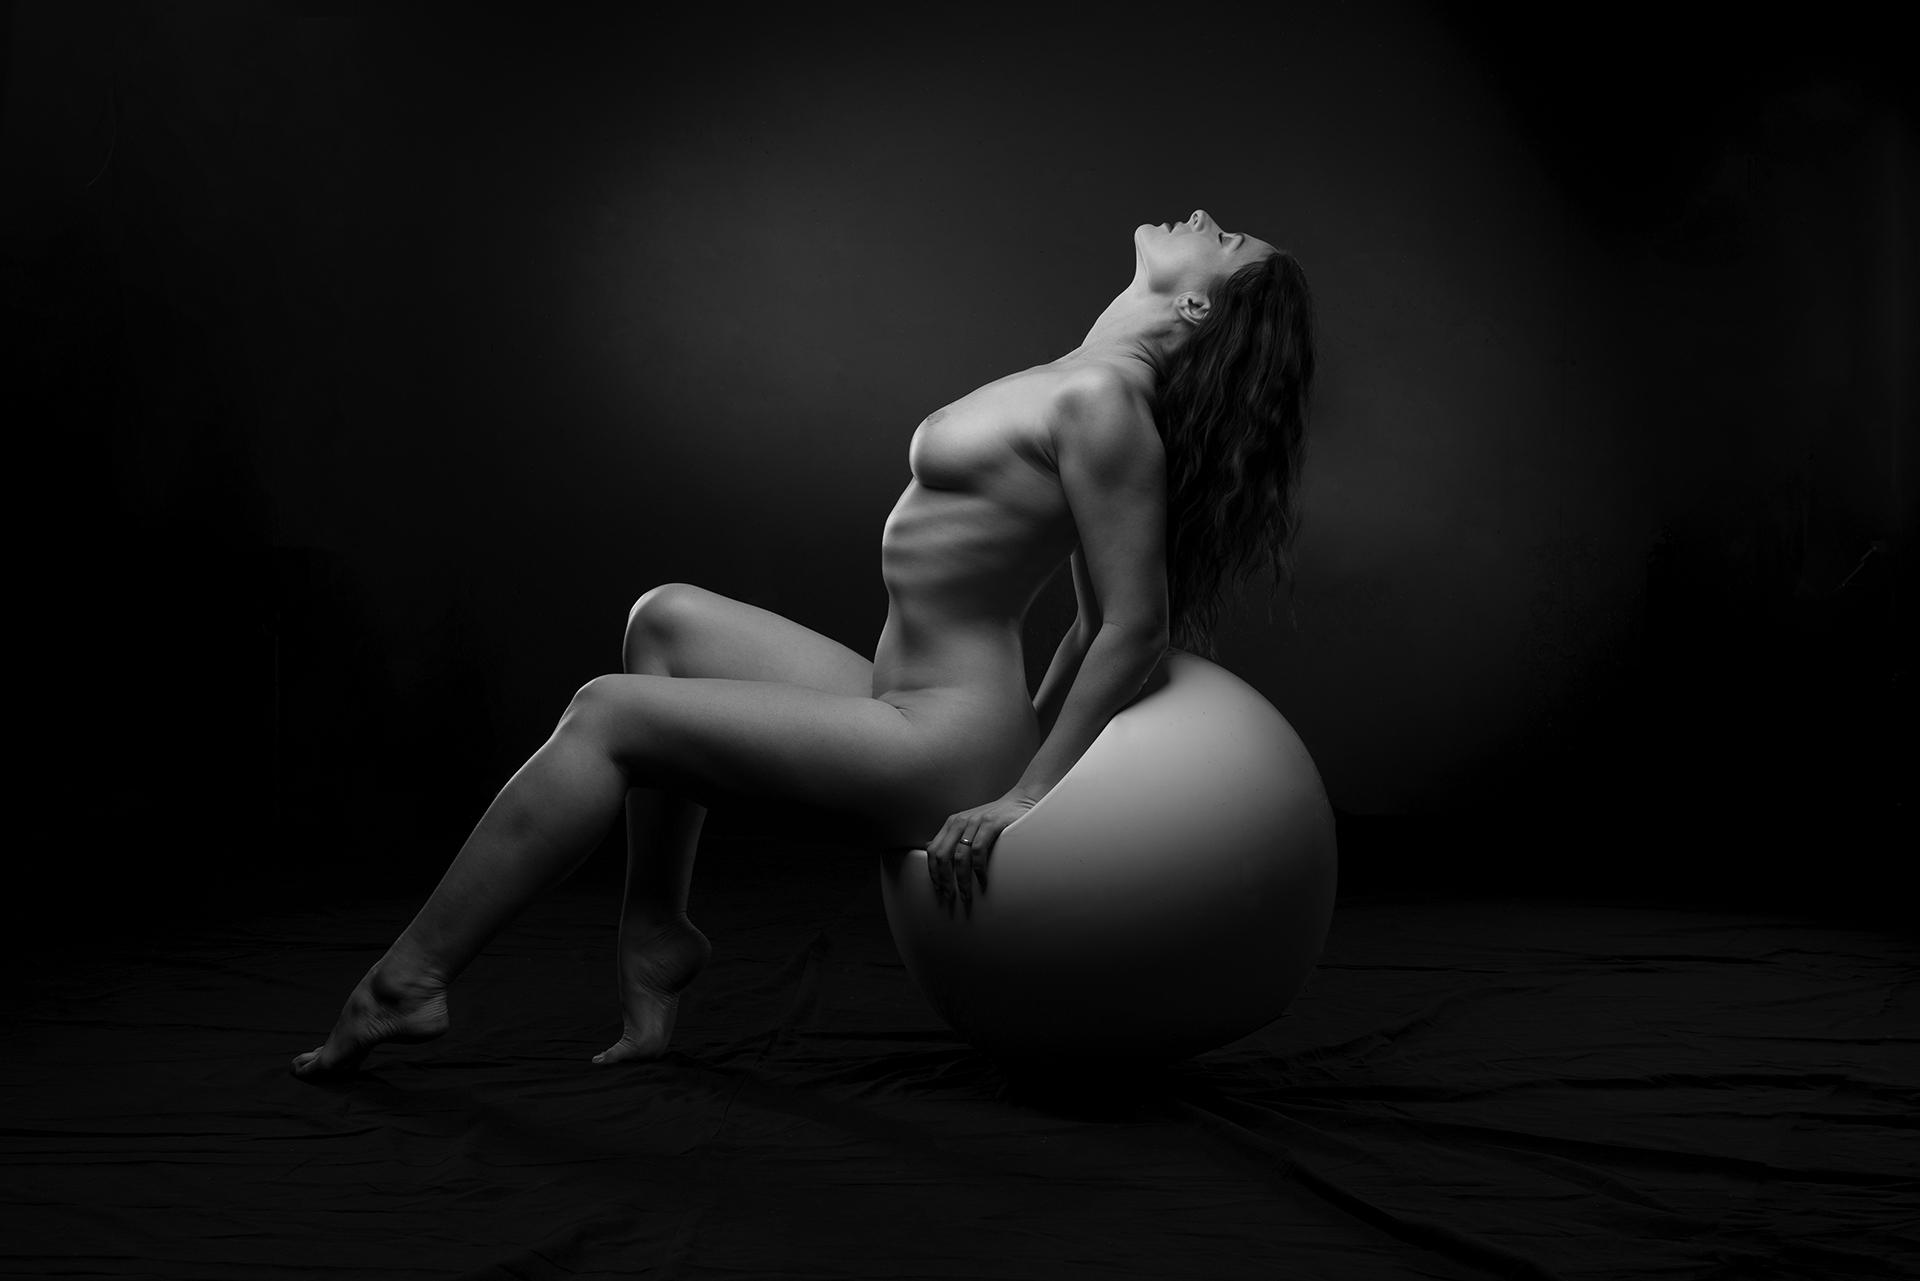 Hugo-Delvaux-nude-5